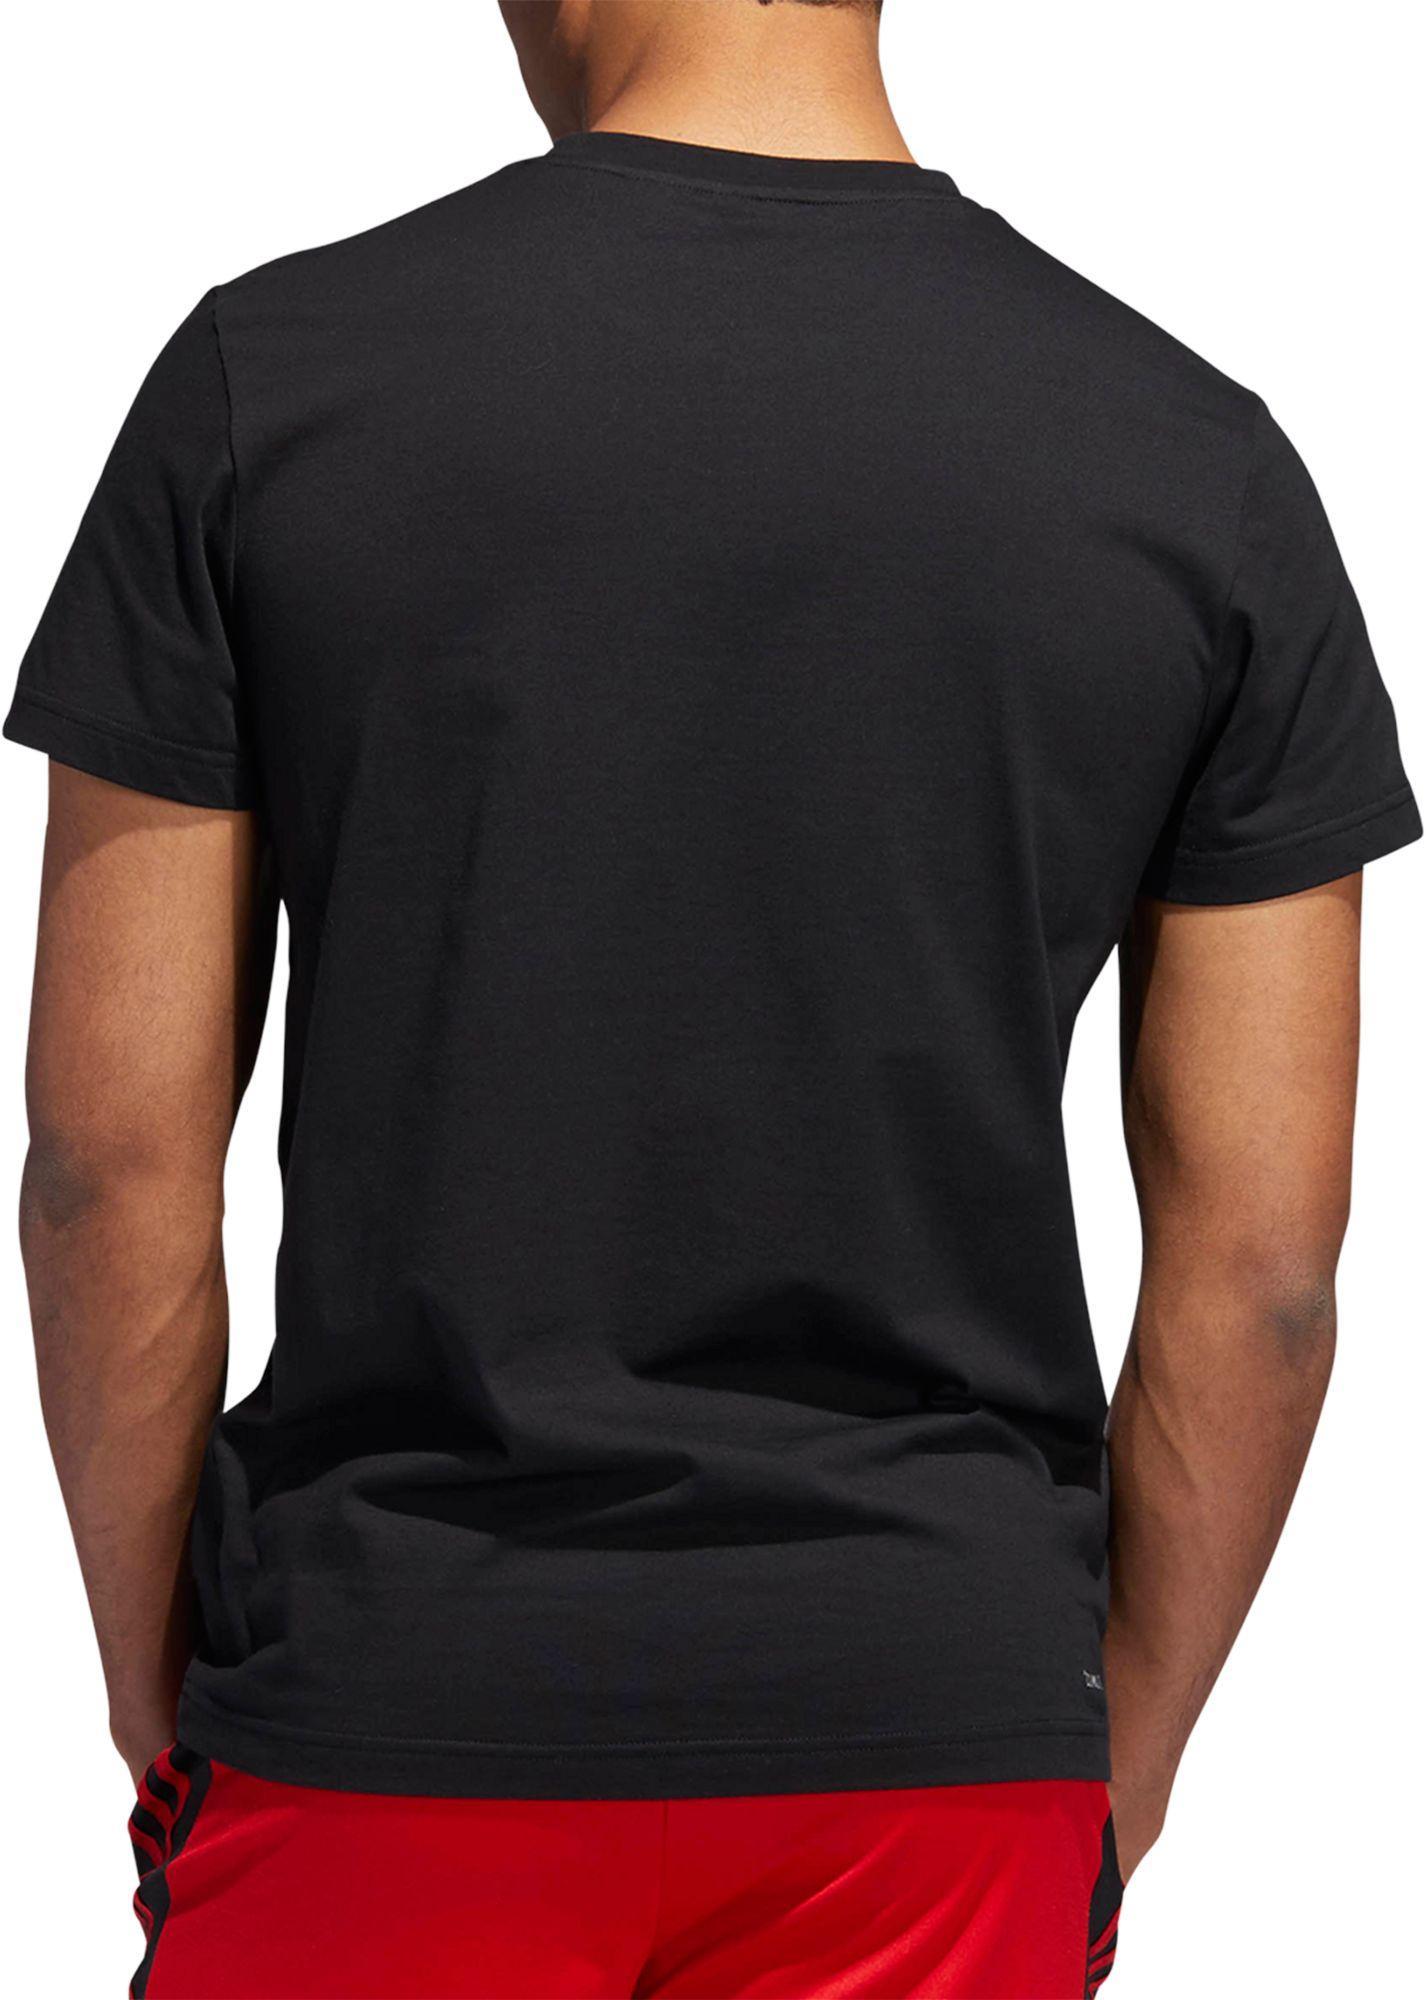 9d76acbafb41 Lyst - adidas T-mac Mz Graphic Basketball T-shirt in Black for Men